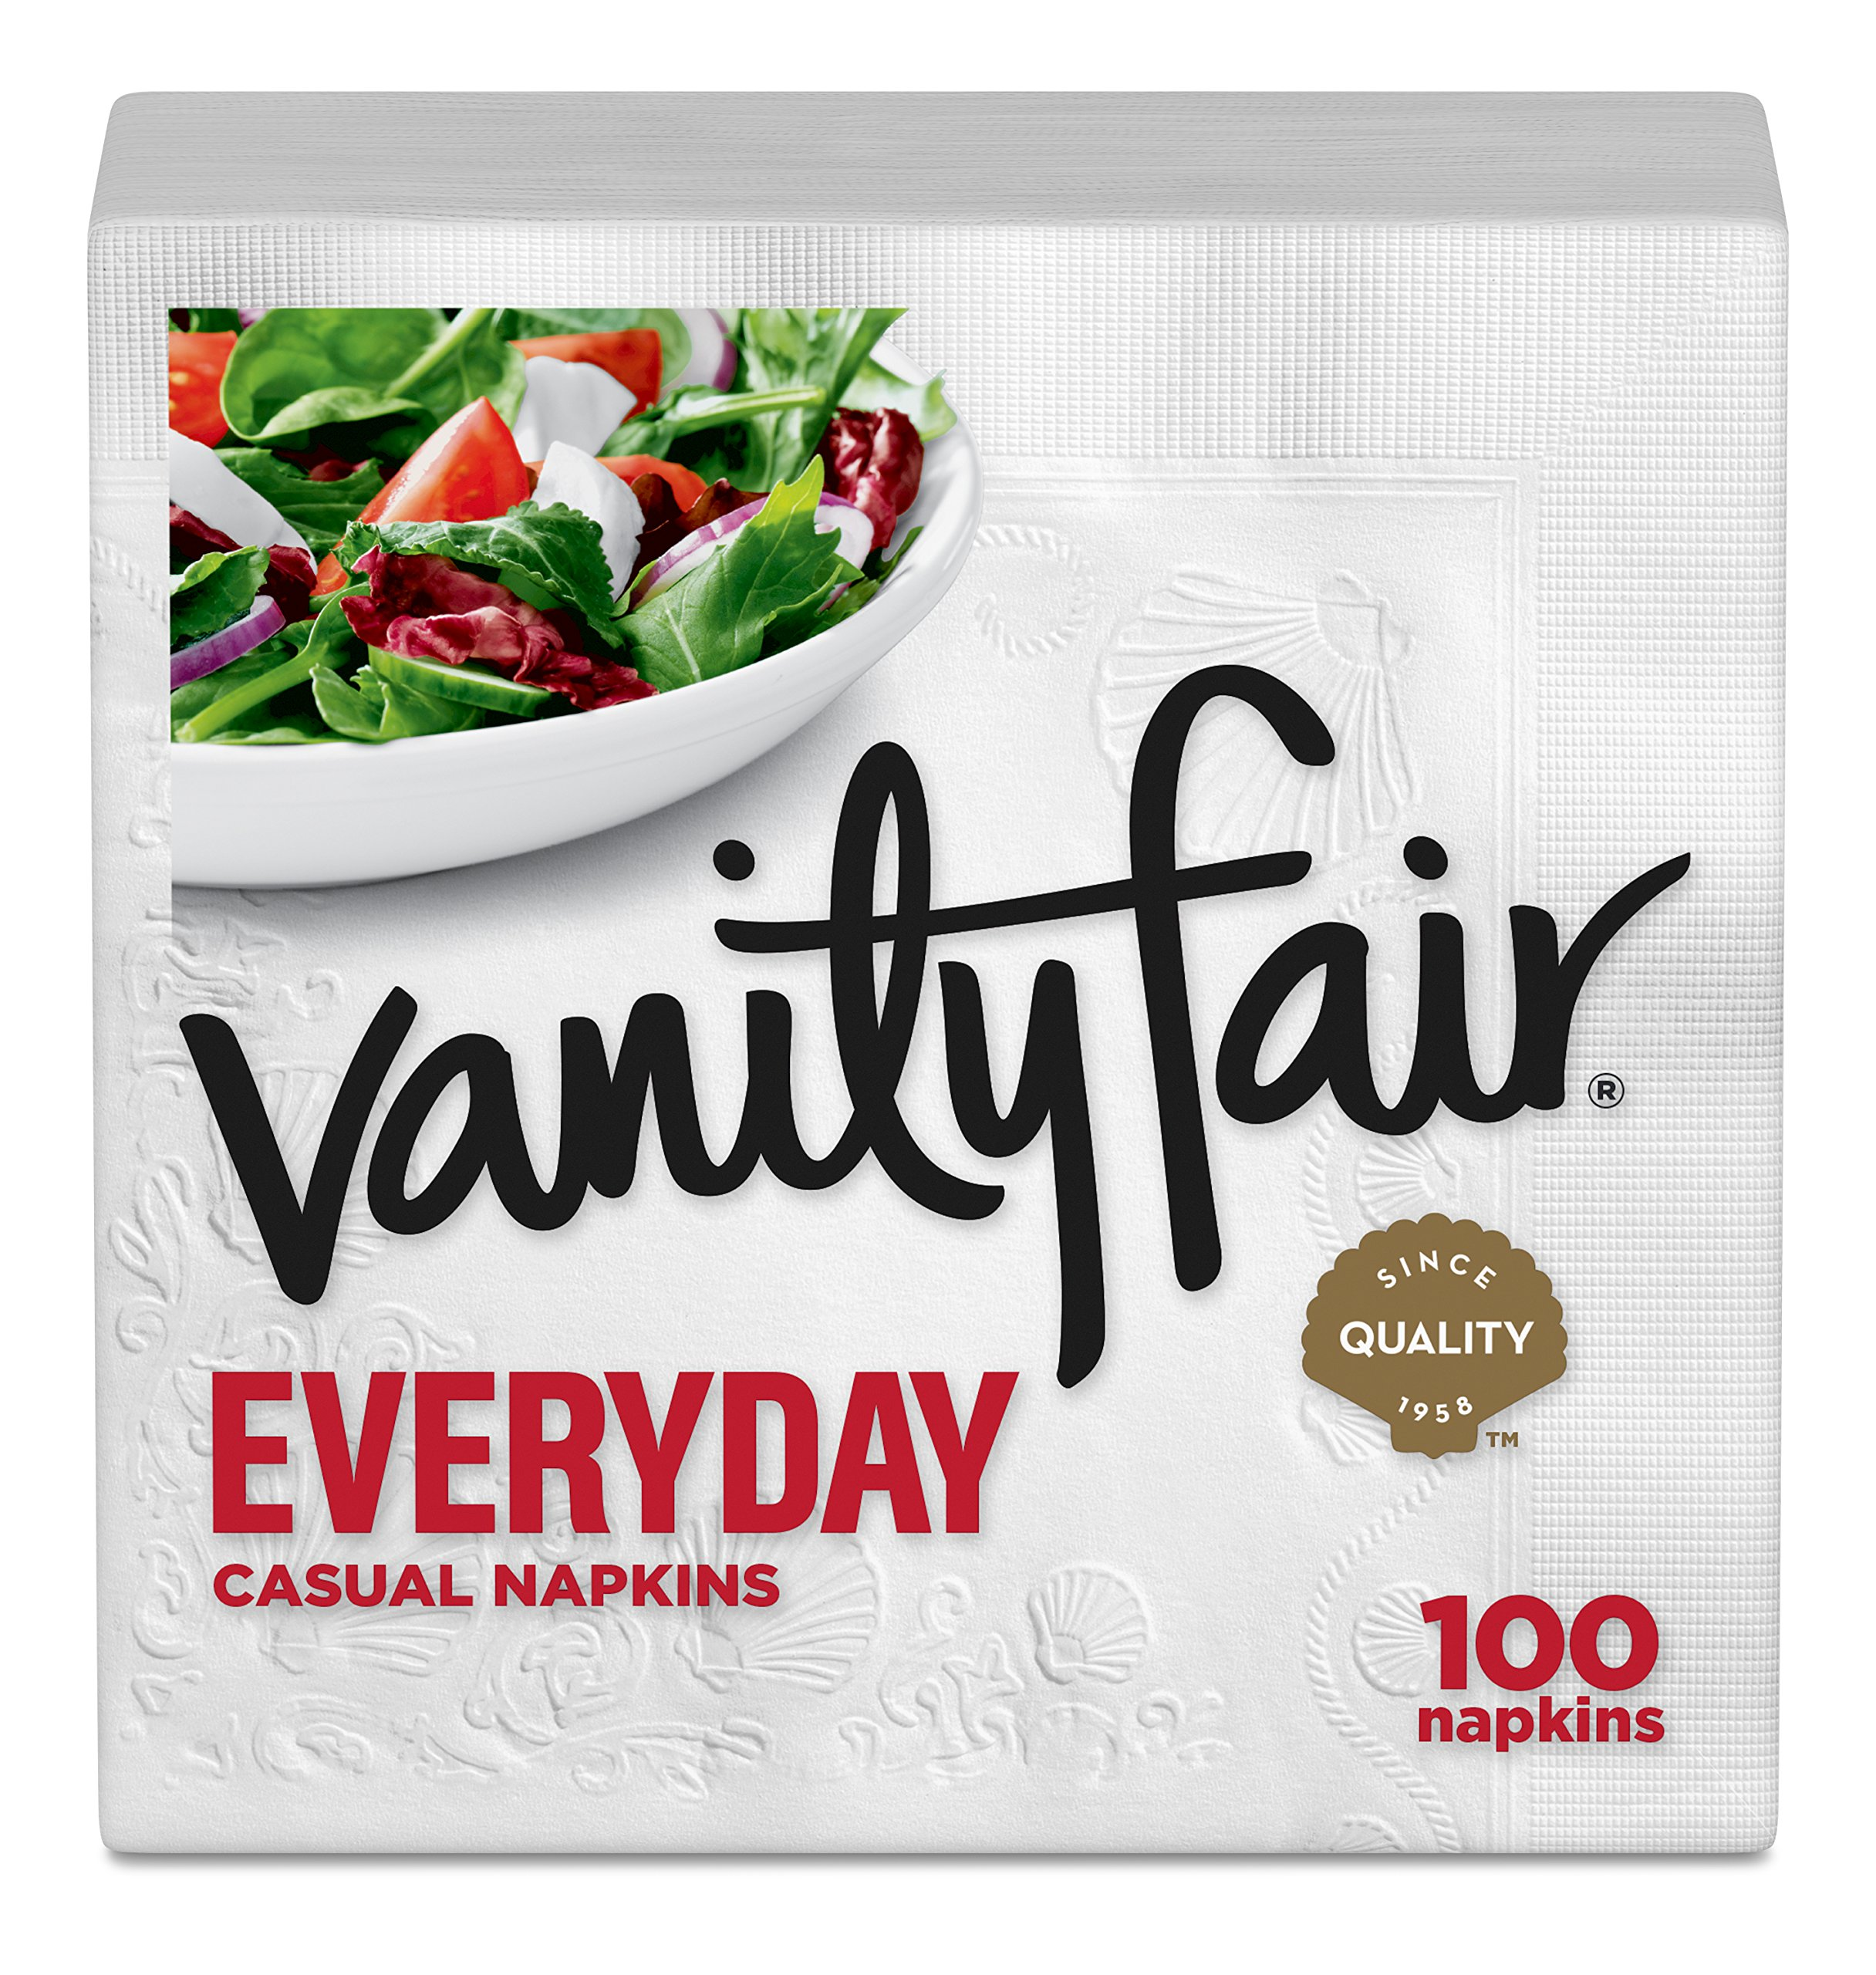 Vanity Fair Everyday Napkins, 100 Count Paper Napkins